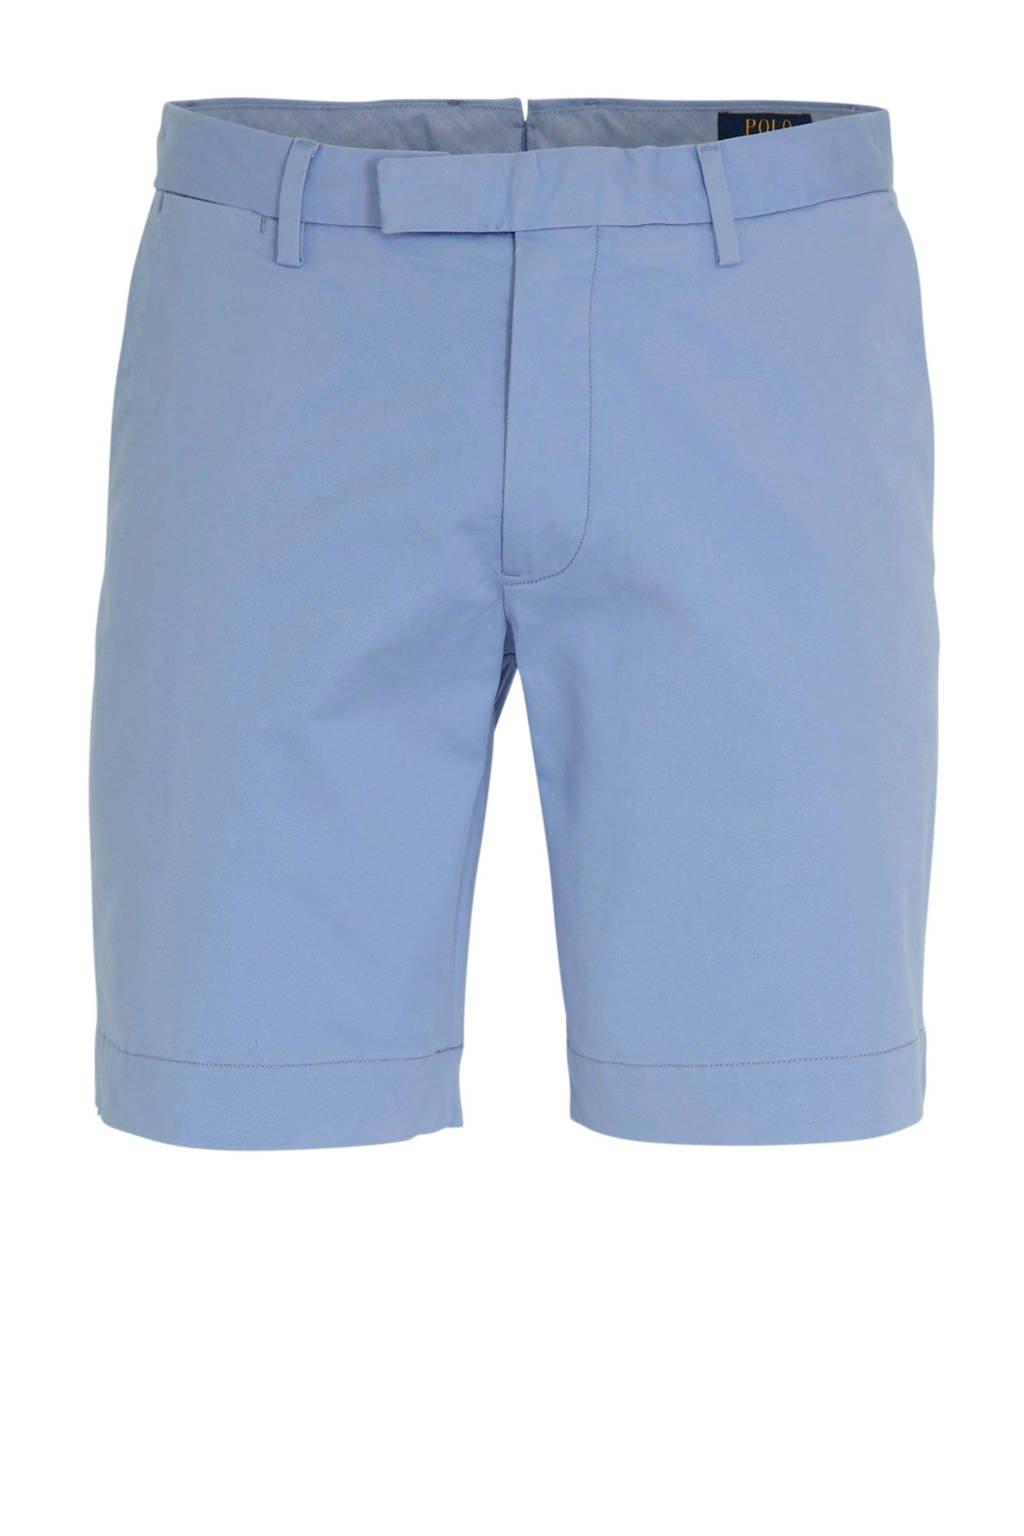 POLO Ralph Lauren slim fit bermuda blauw, Blauw